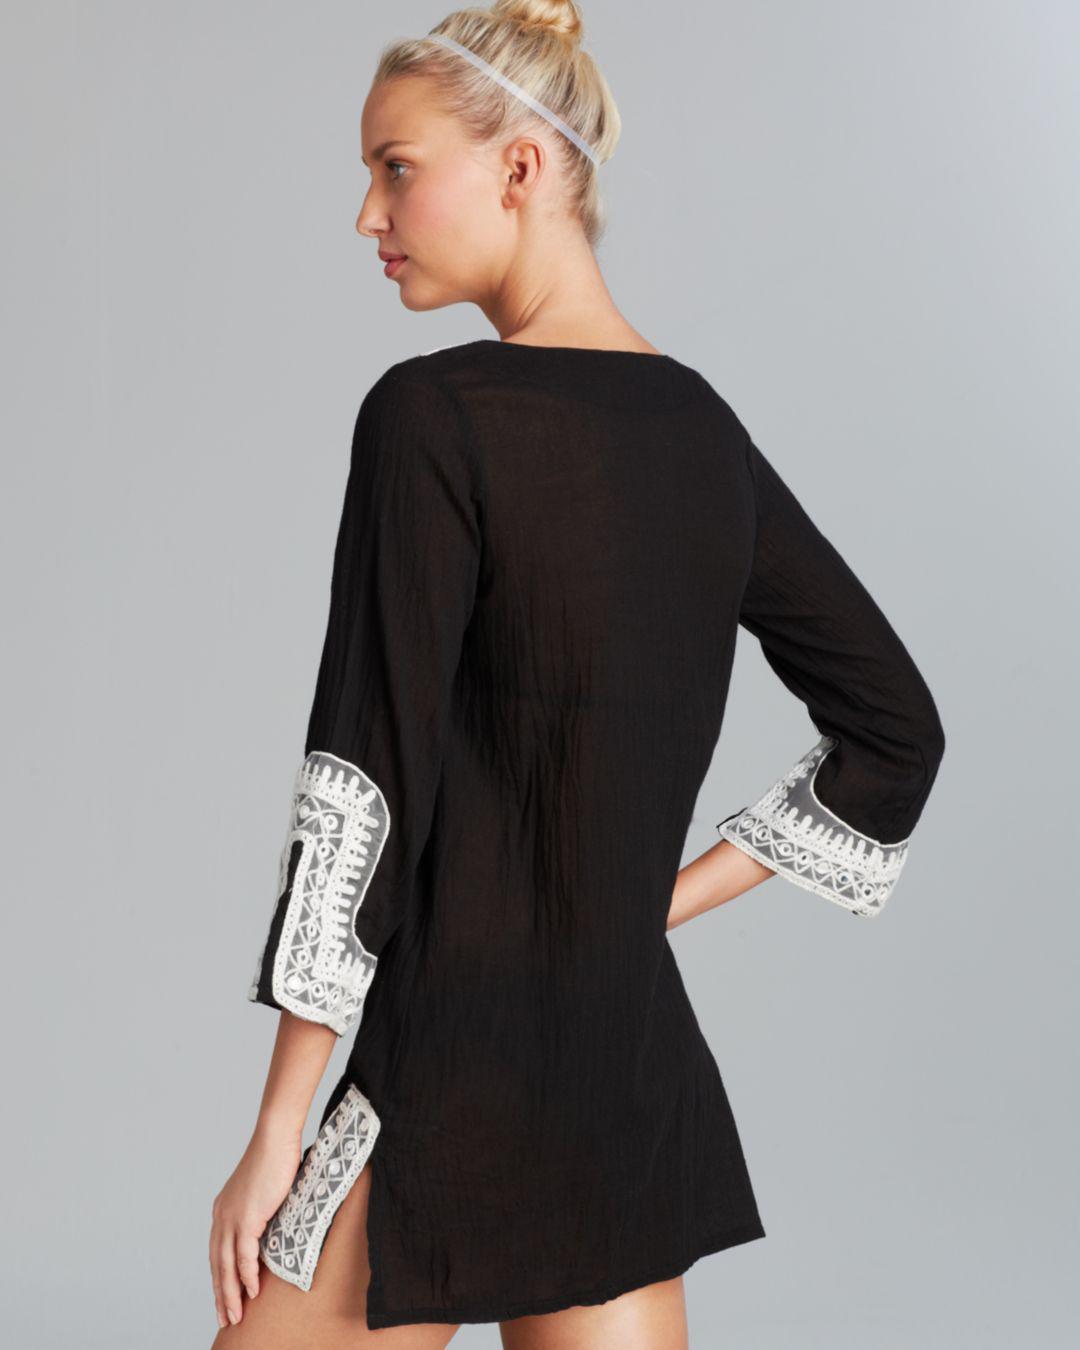 1103c49441 Debbie Katz Shanti Mirror Cotton Gauze Tunic Swim Cover Up in Black ...